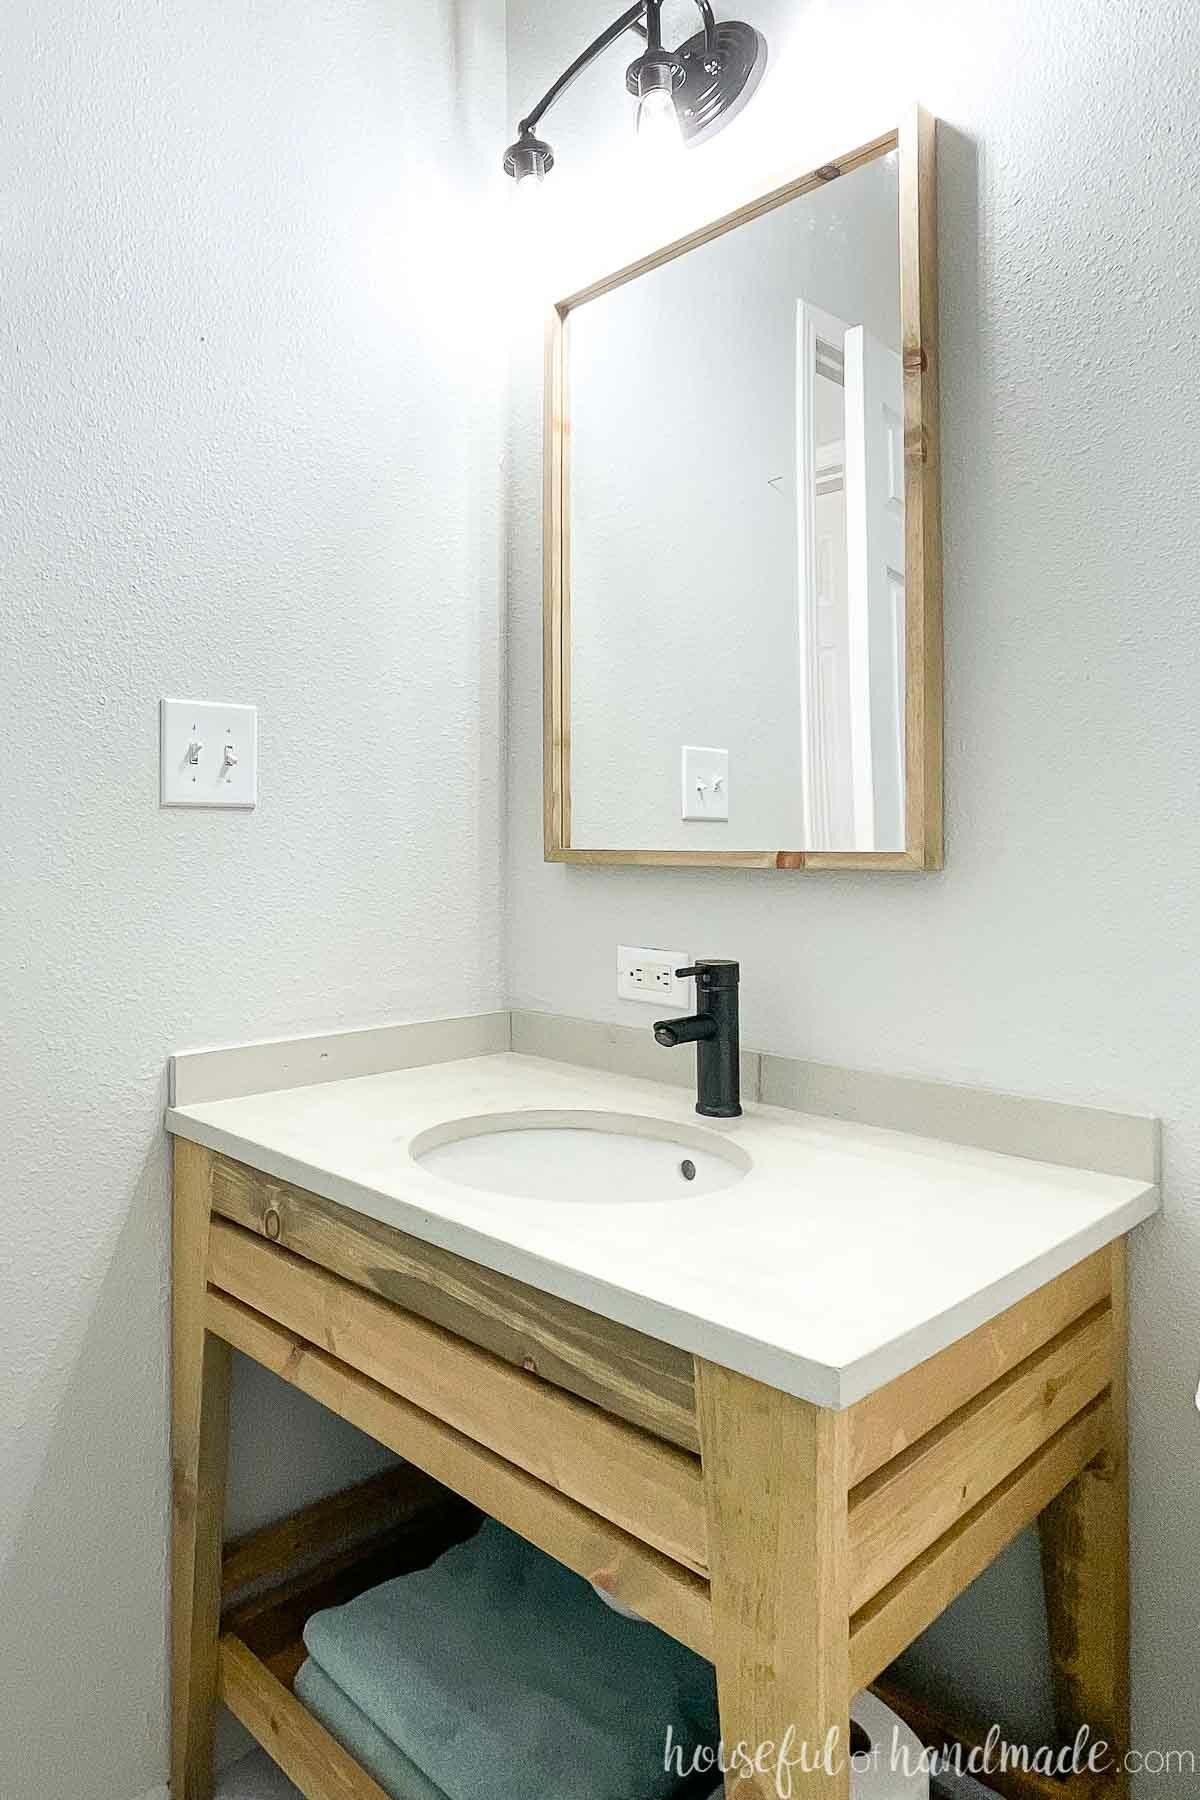 Corner view of the budget bathroom vanity remodel showing the DIY concrete vanity top on the open wood vanity.